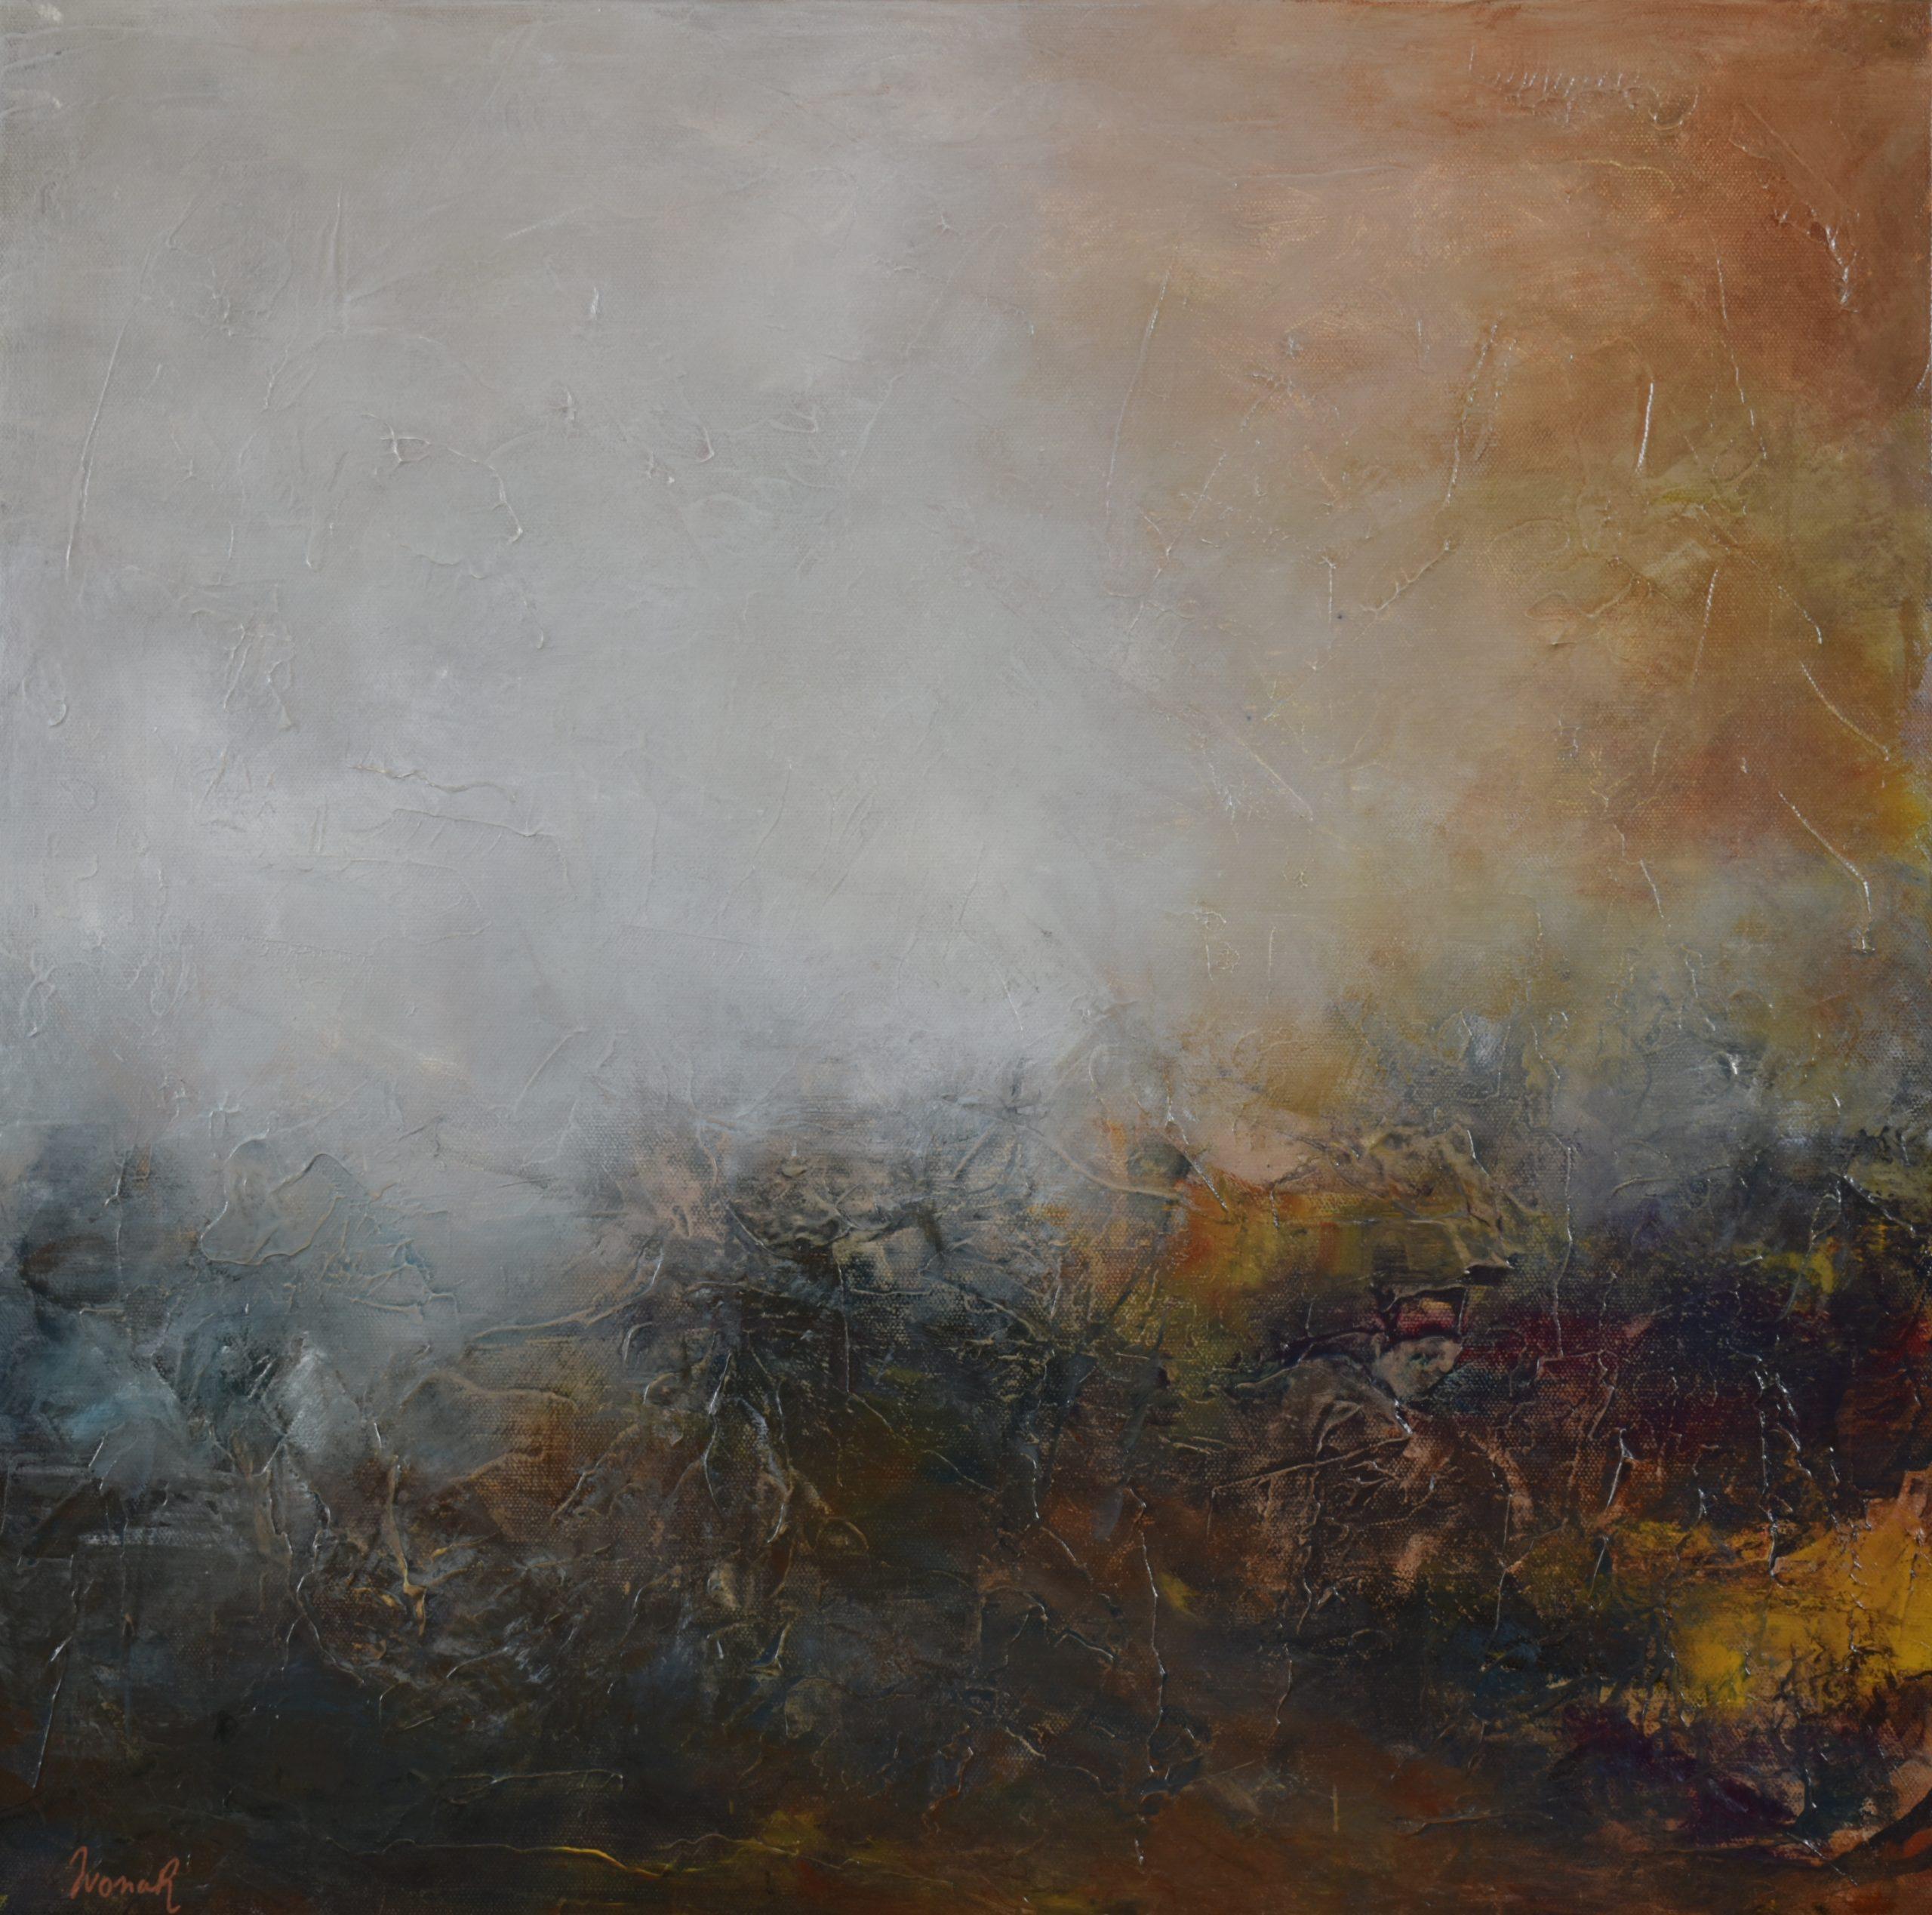 Ivona Radic Timeless 56×56 Abstract Landscape